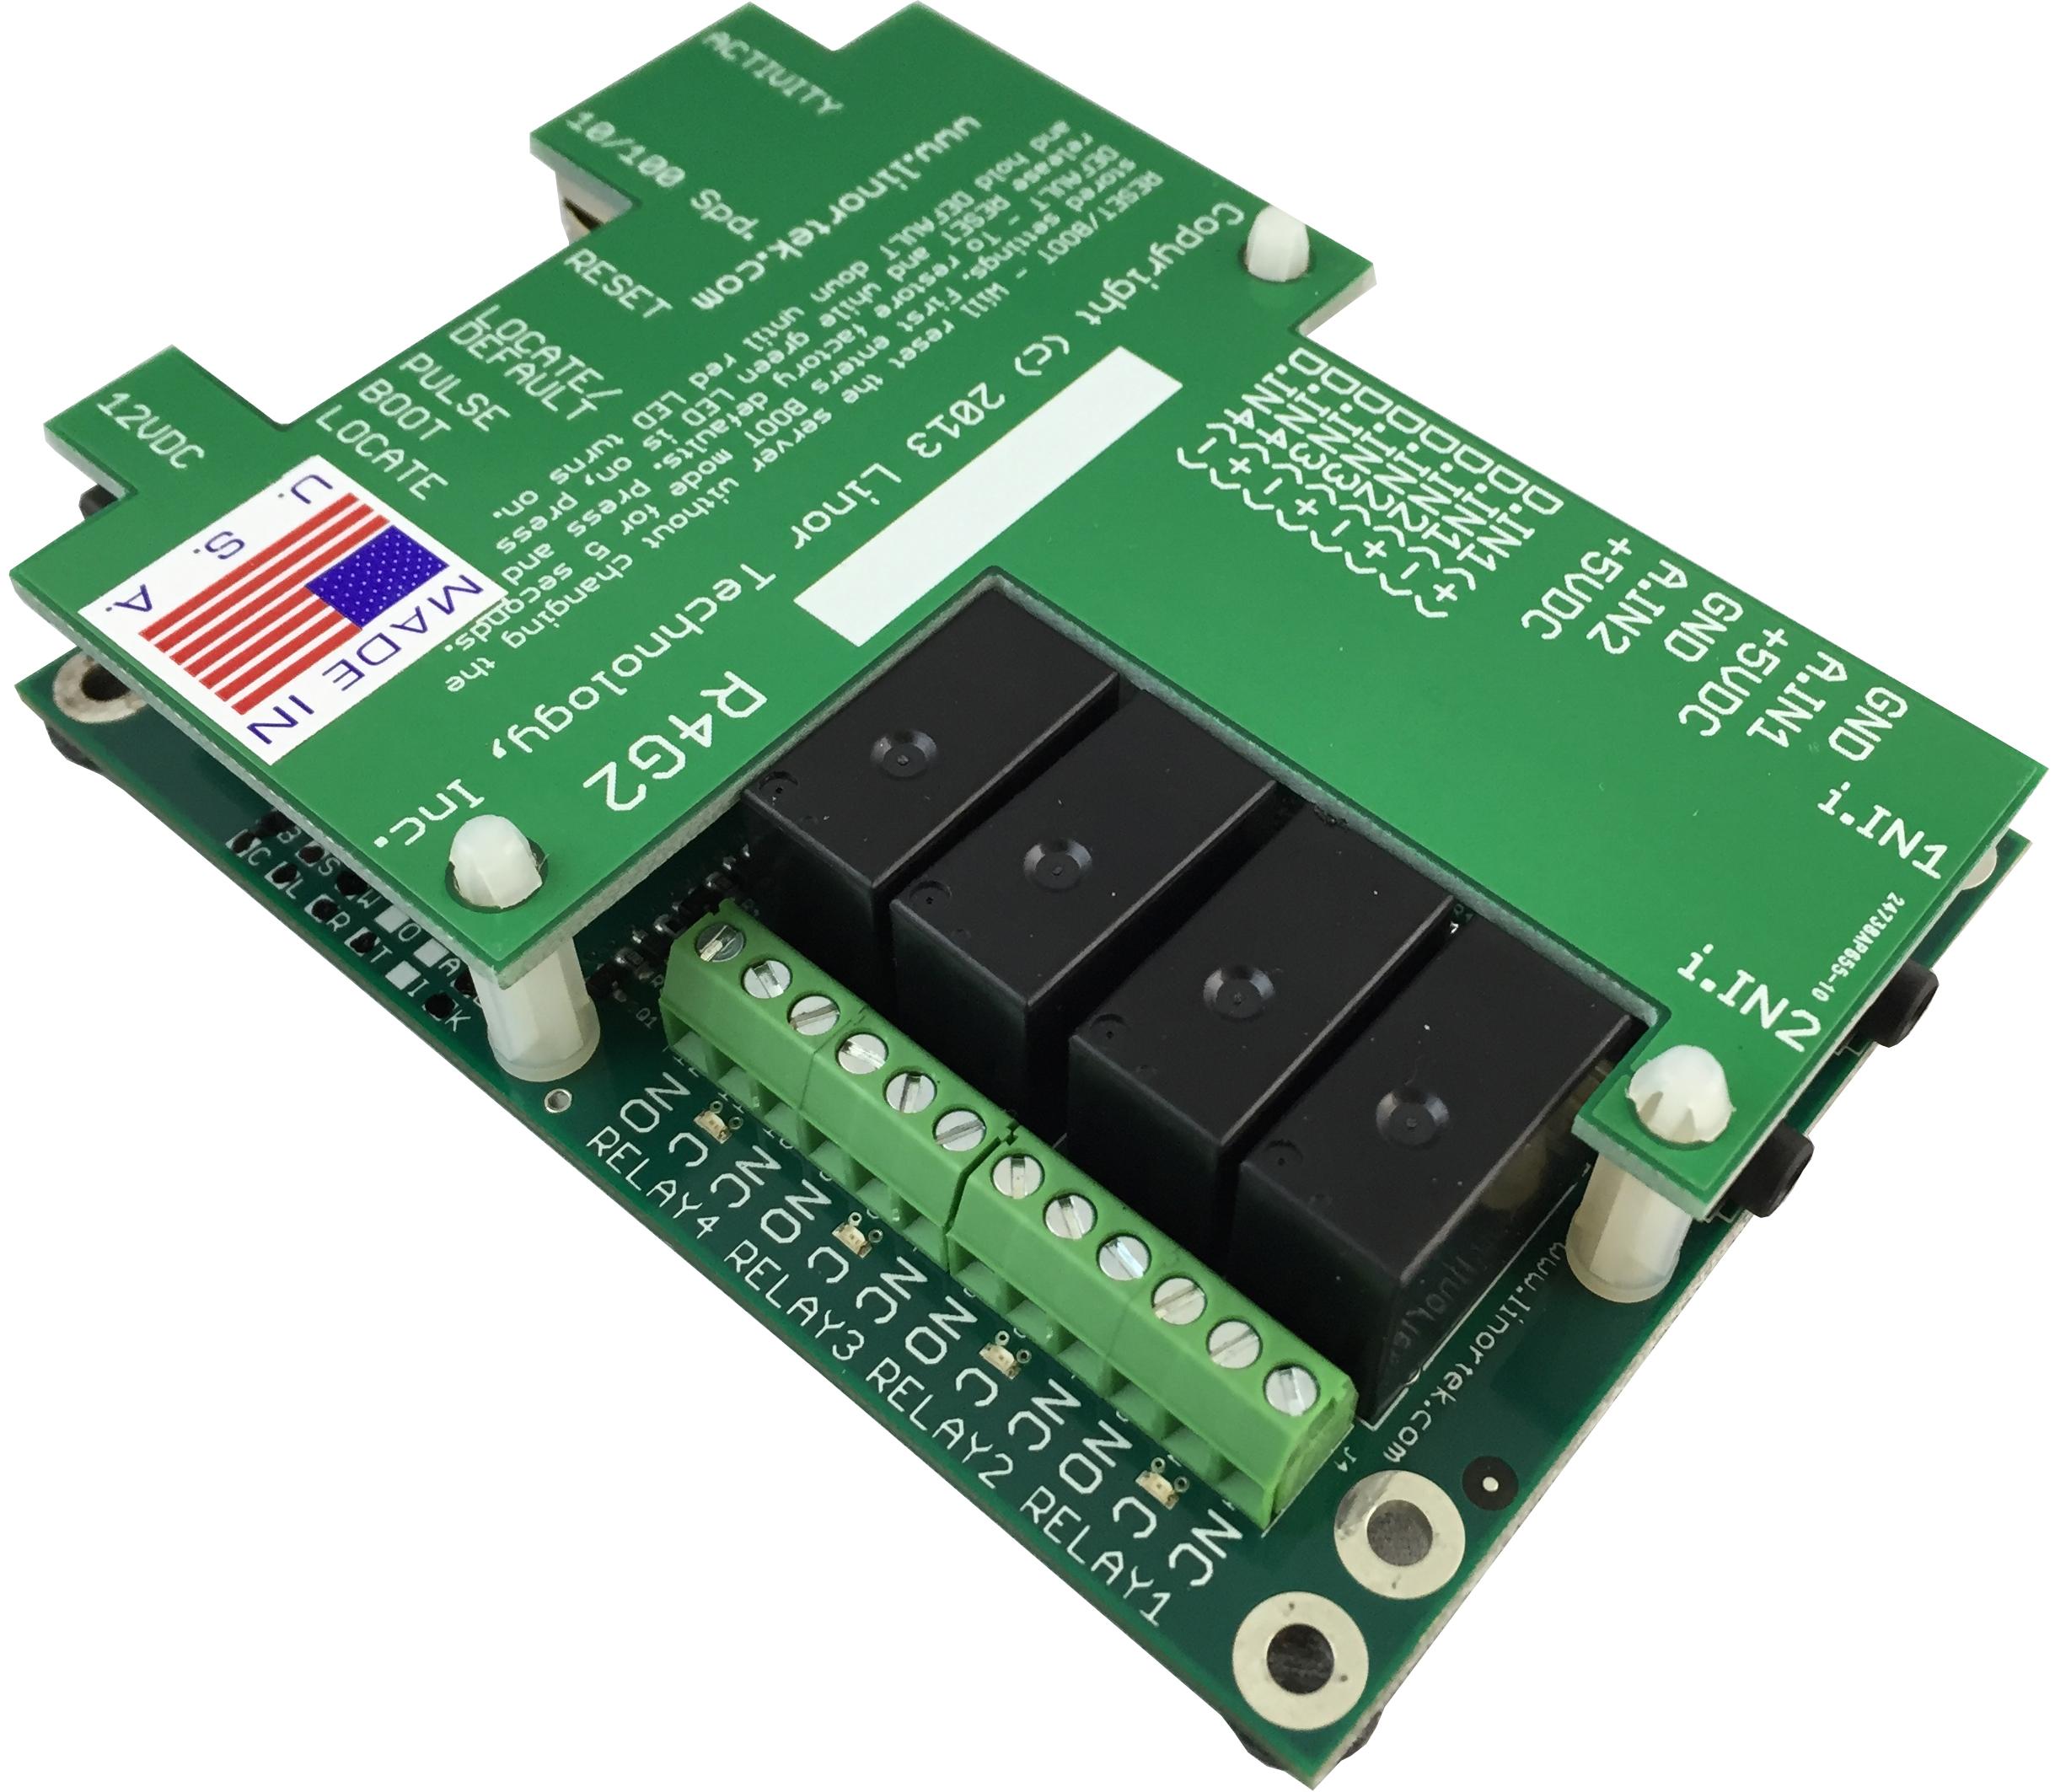 Fargo G2r4adi Web Based Tcp Ip Ethernet I O Relay Remote Control Circuit Boardbuy Cheap Board Monitoring